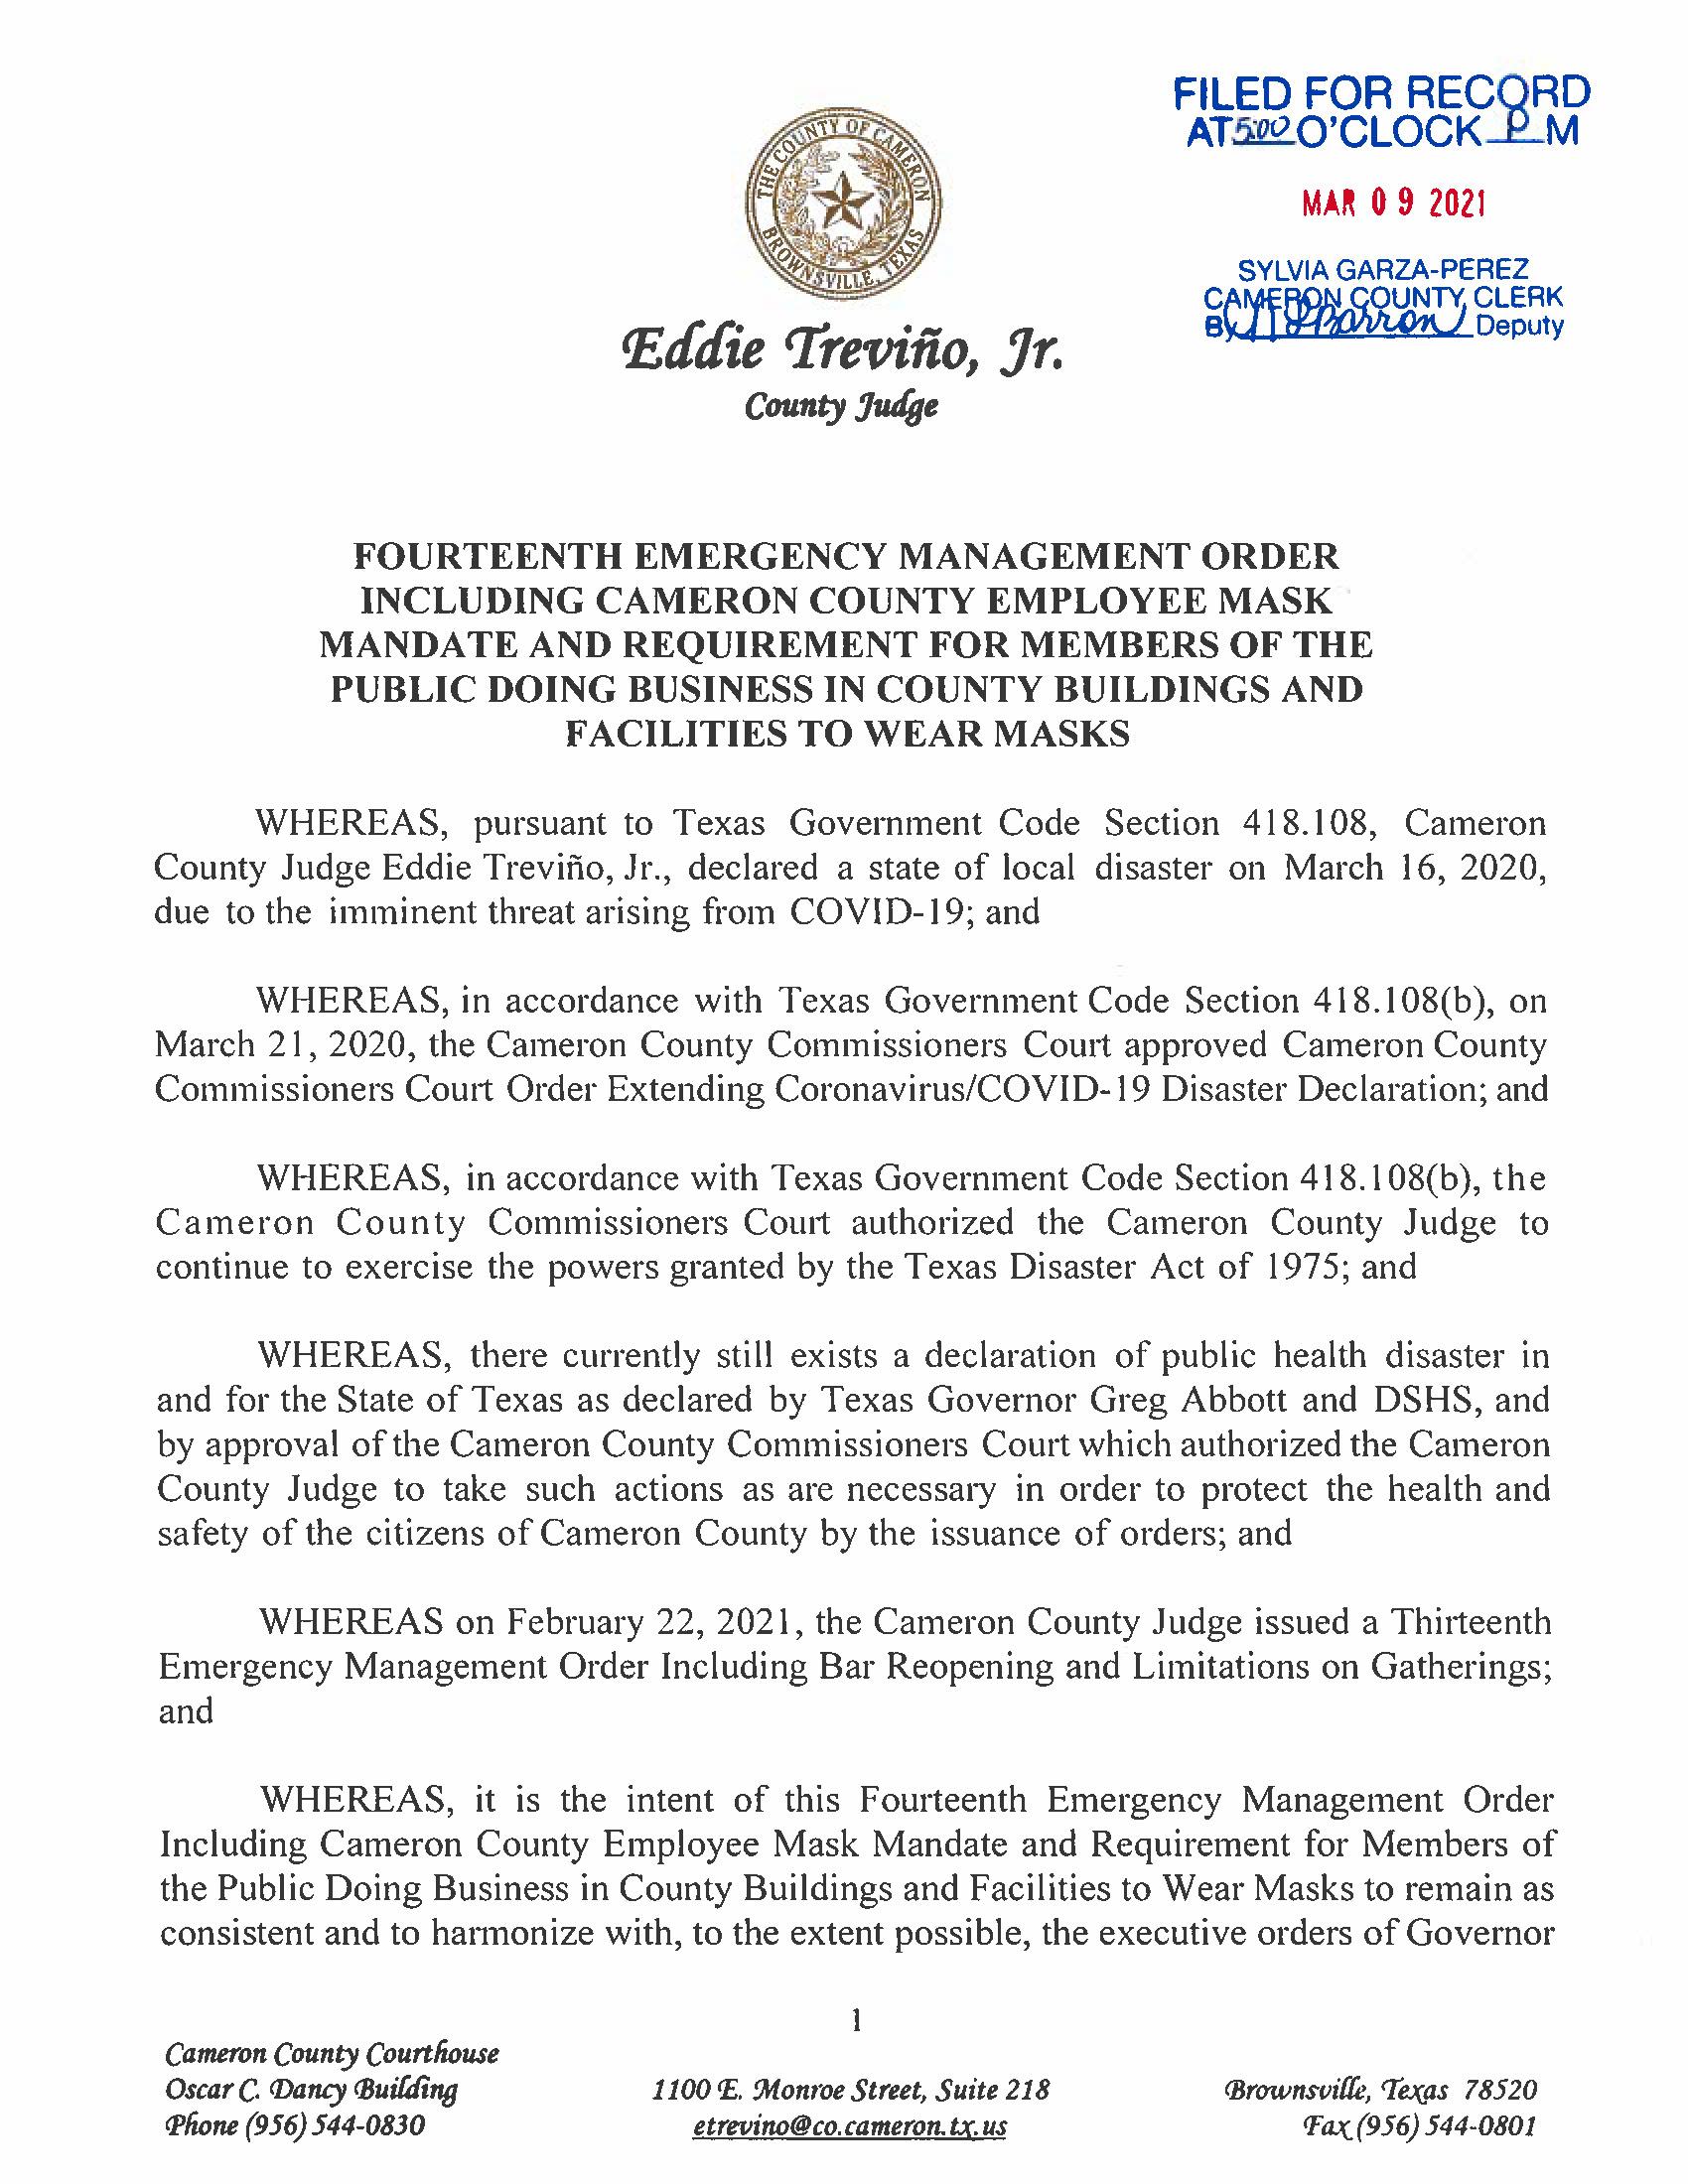 3.9.21 Fourteenth Emergency Management Order Page 1